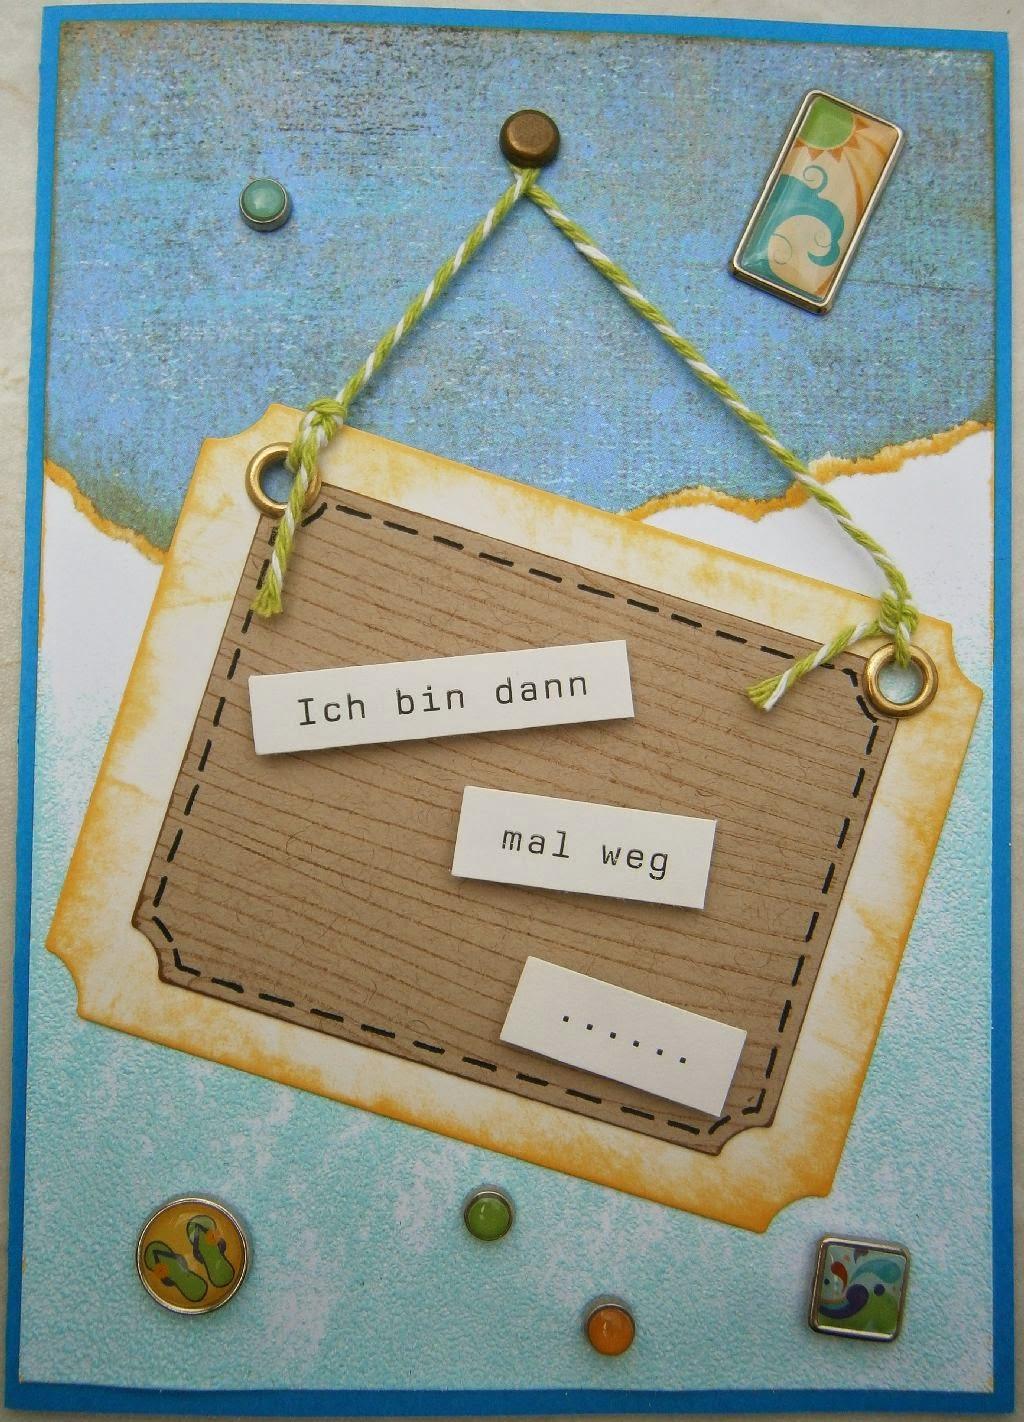 A'inahs Traumkiste: Karten-Ketting: Ich bin dann mal weg